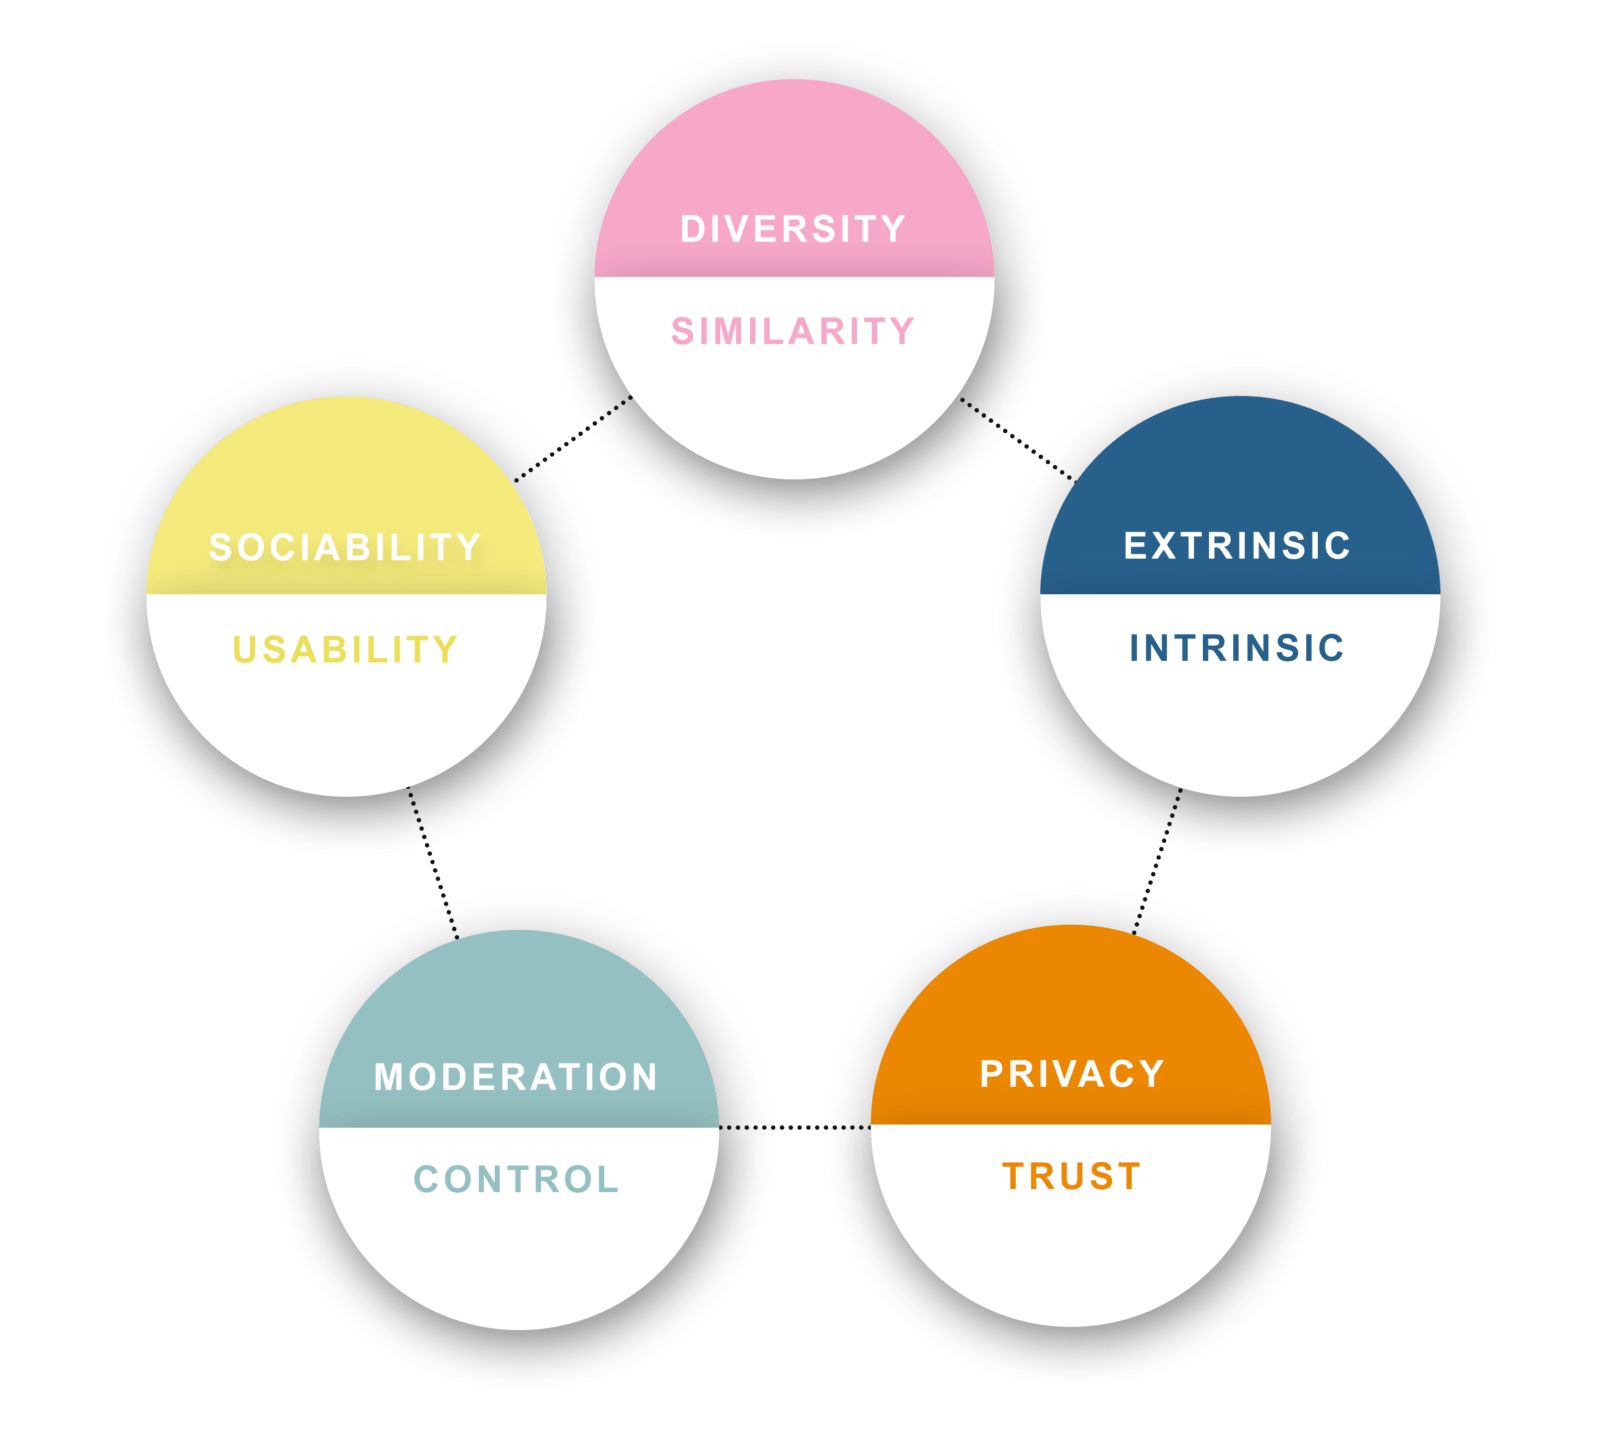 Five building blocks for creating successful online patient communities